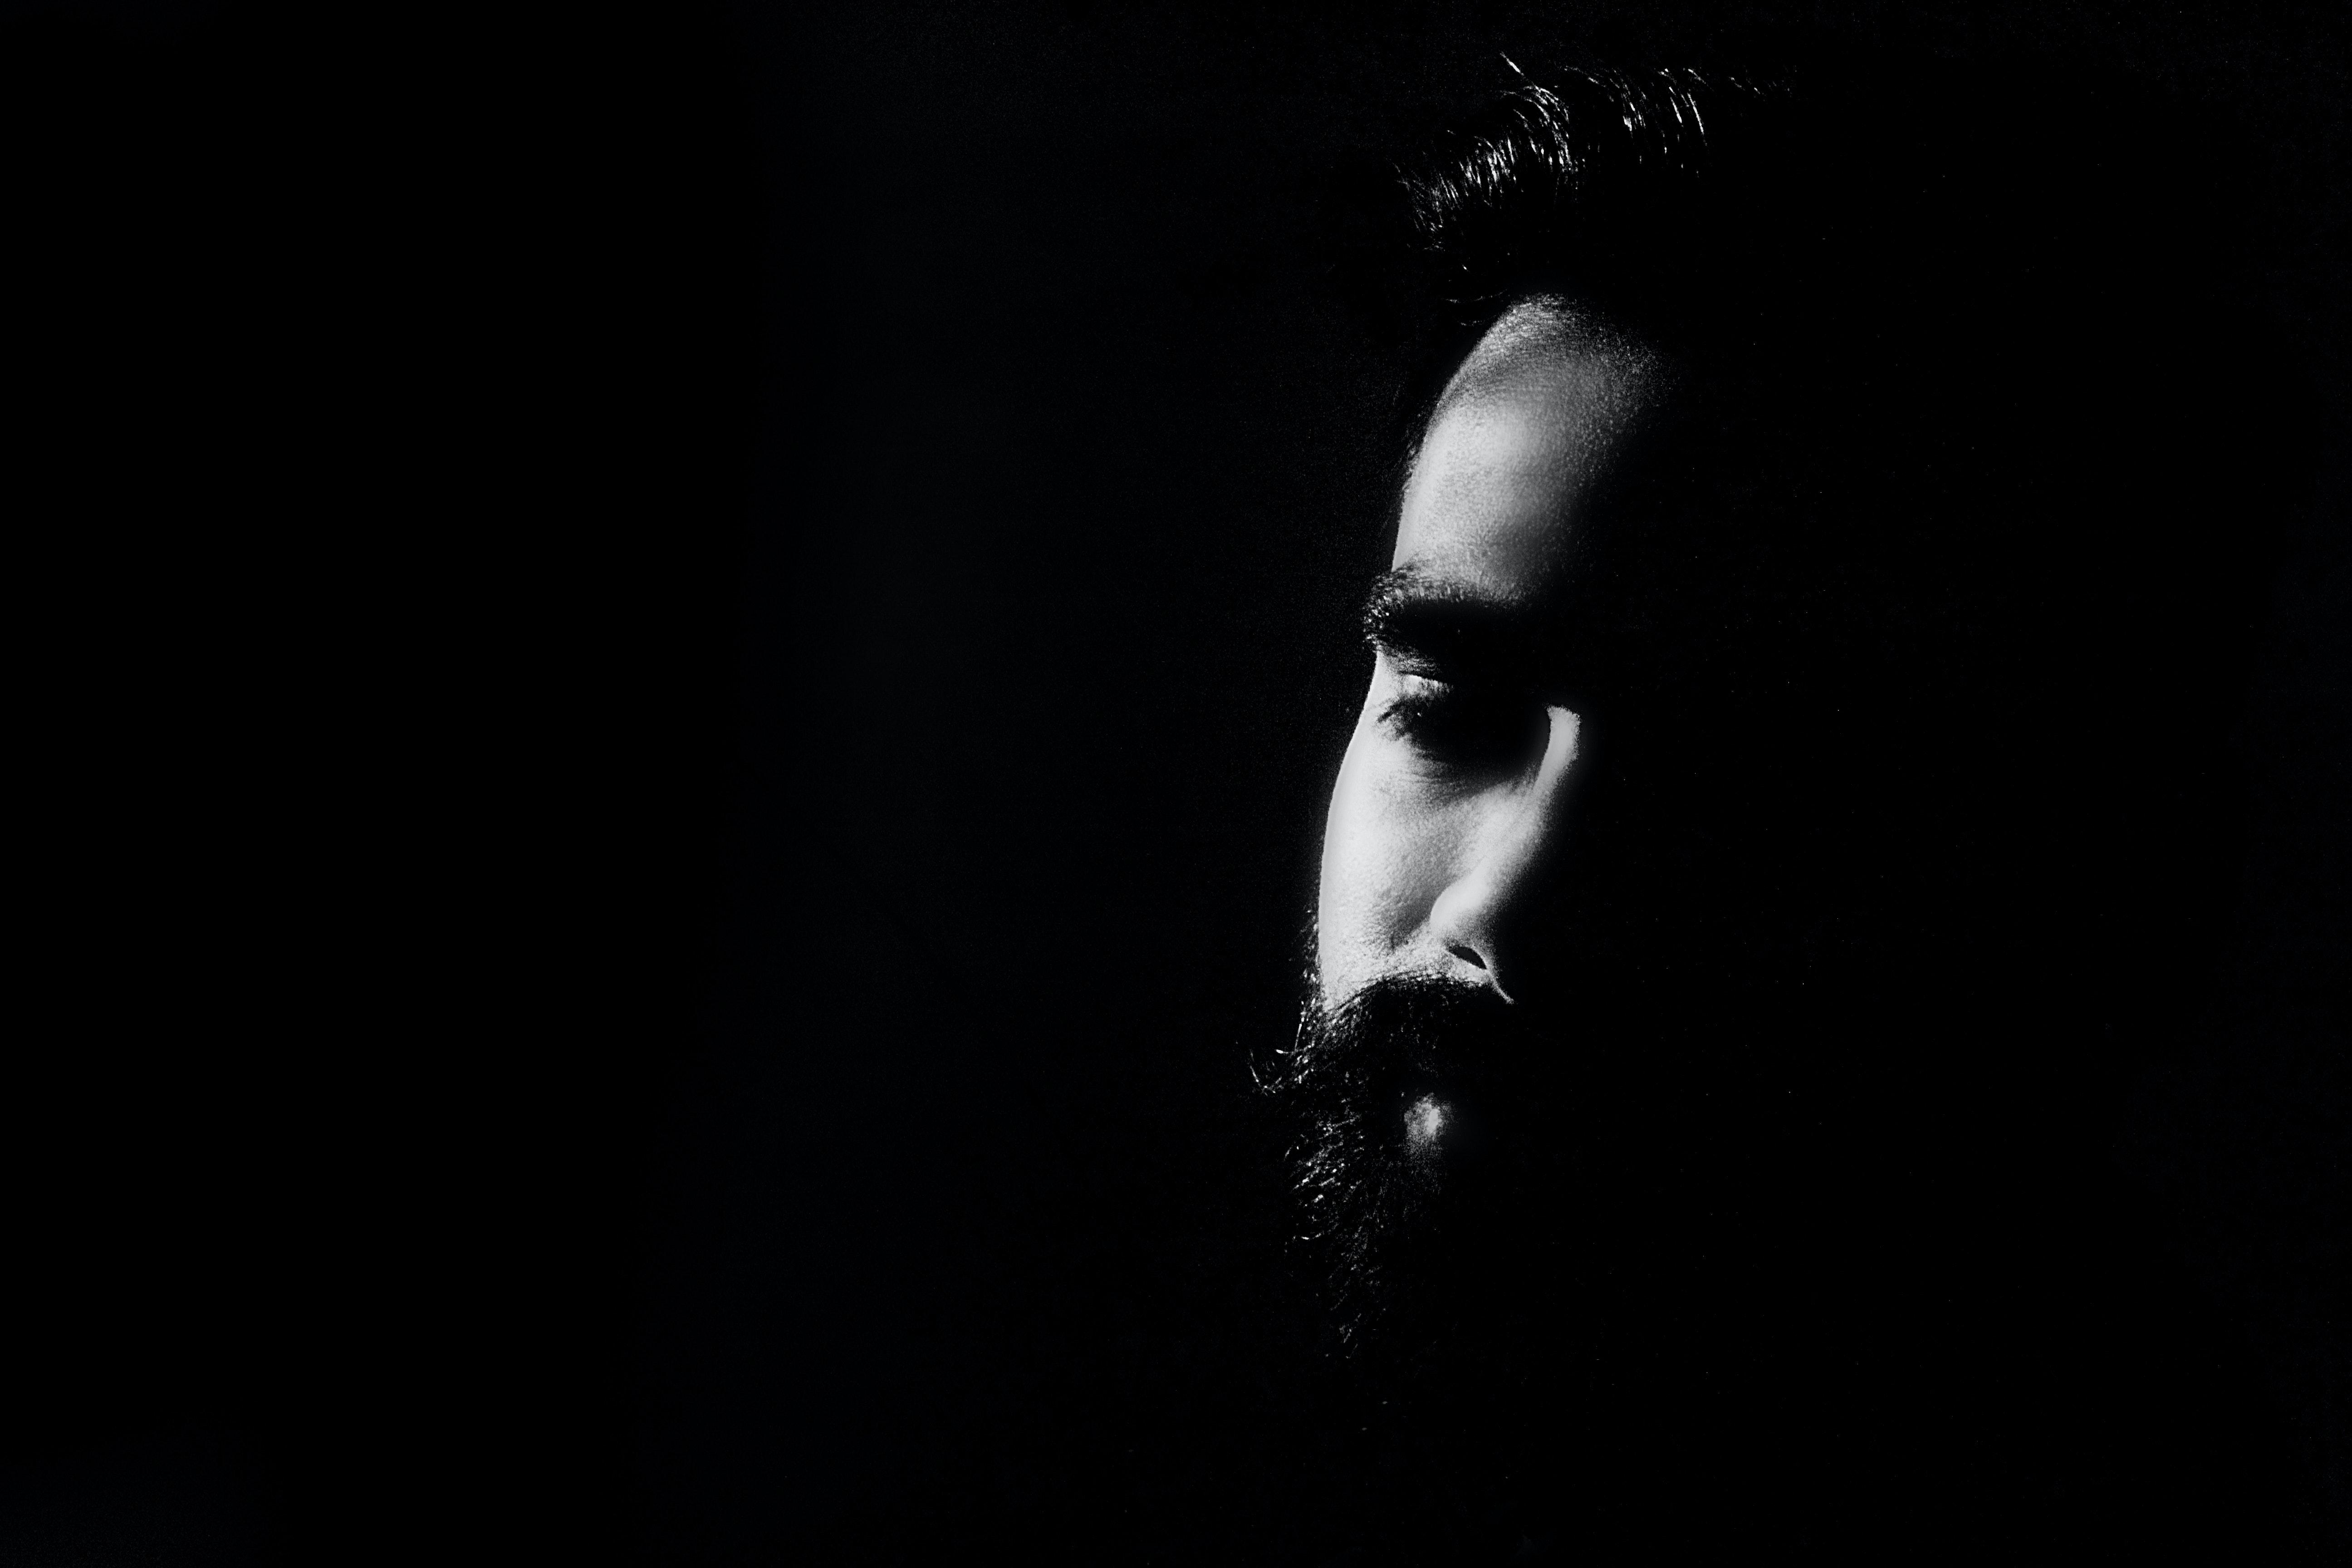 Man With Black Beard Free Stock Photo